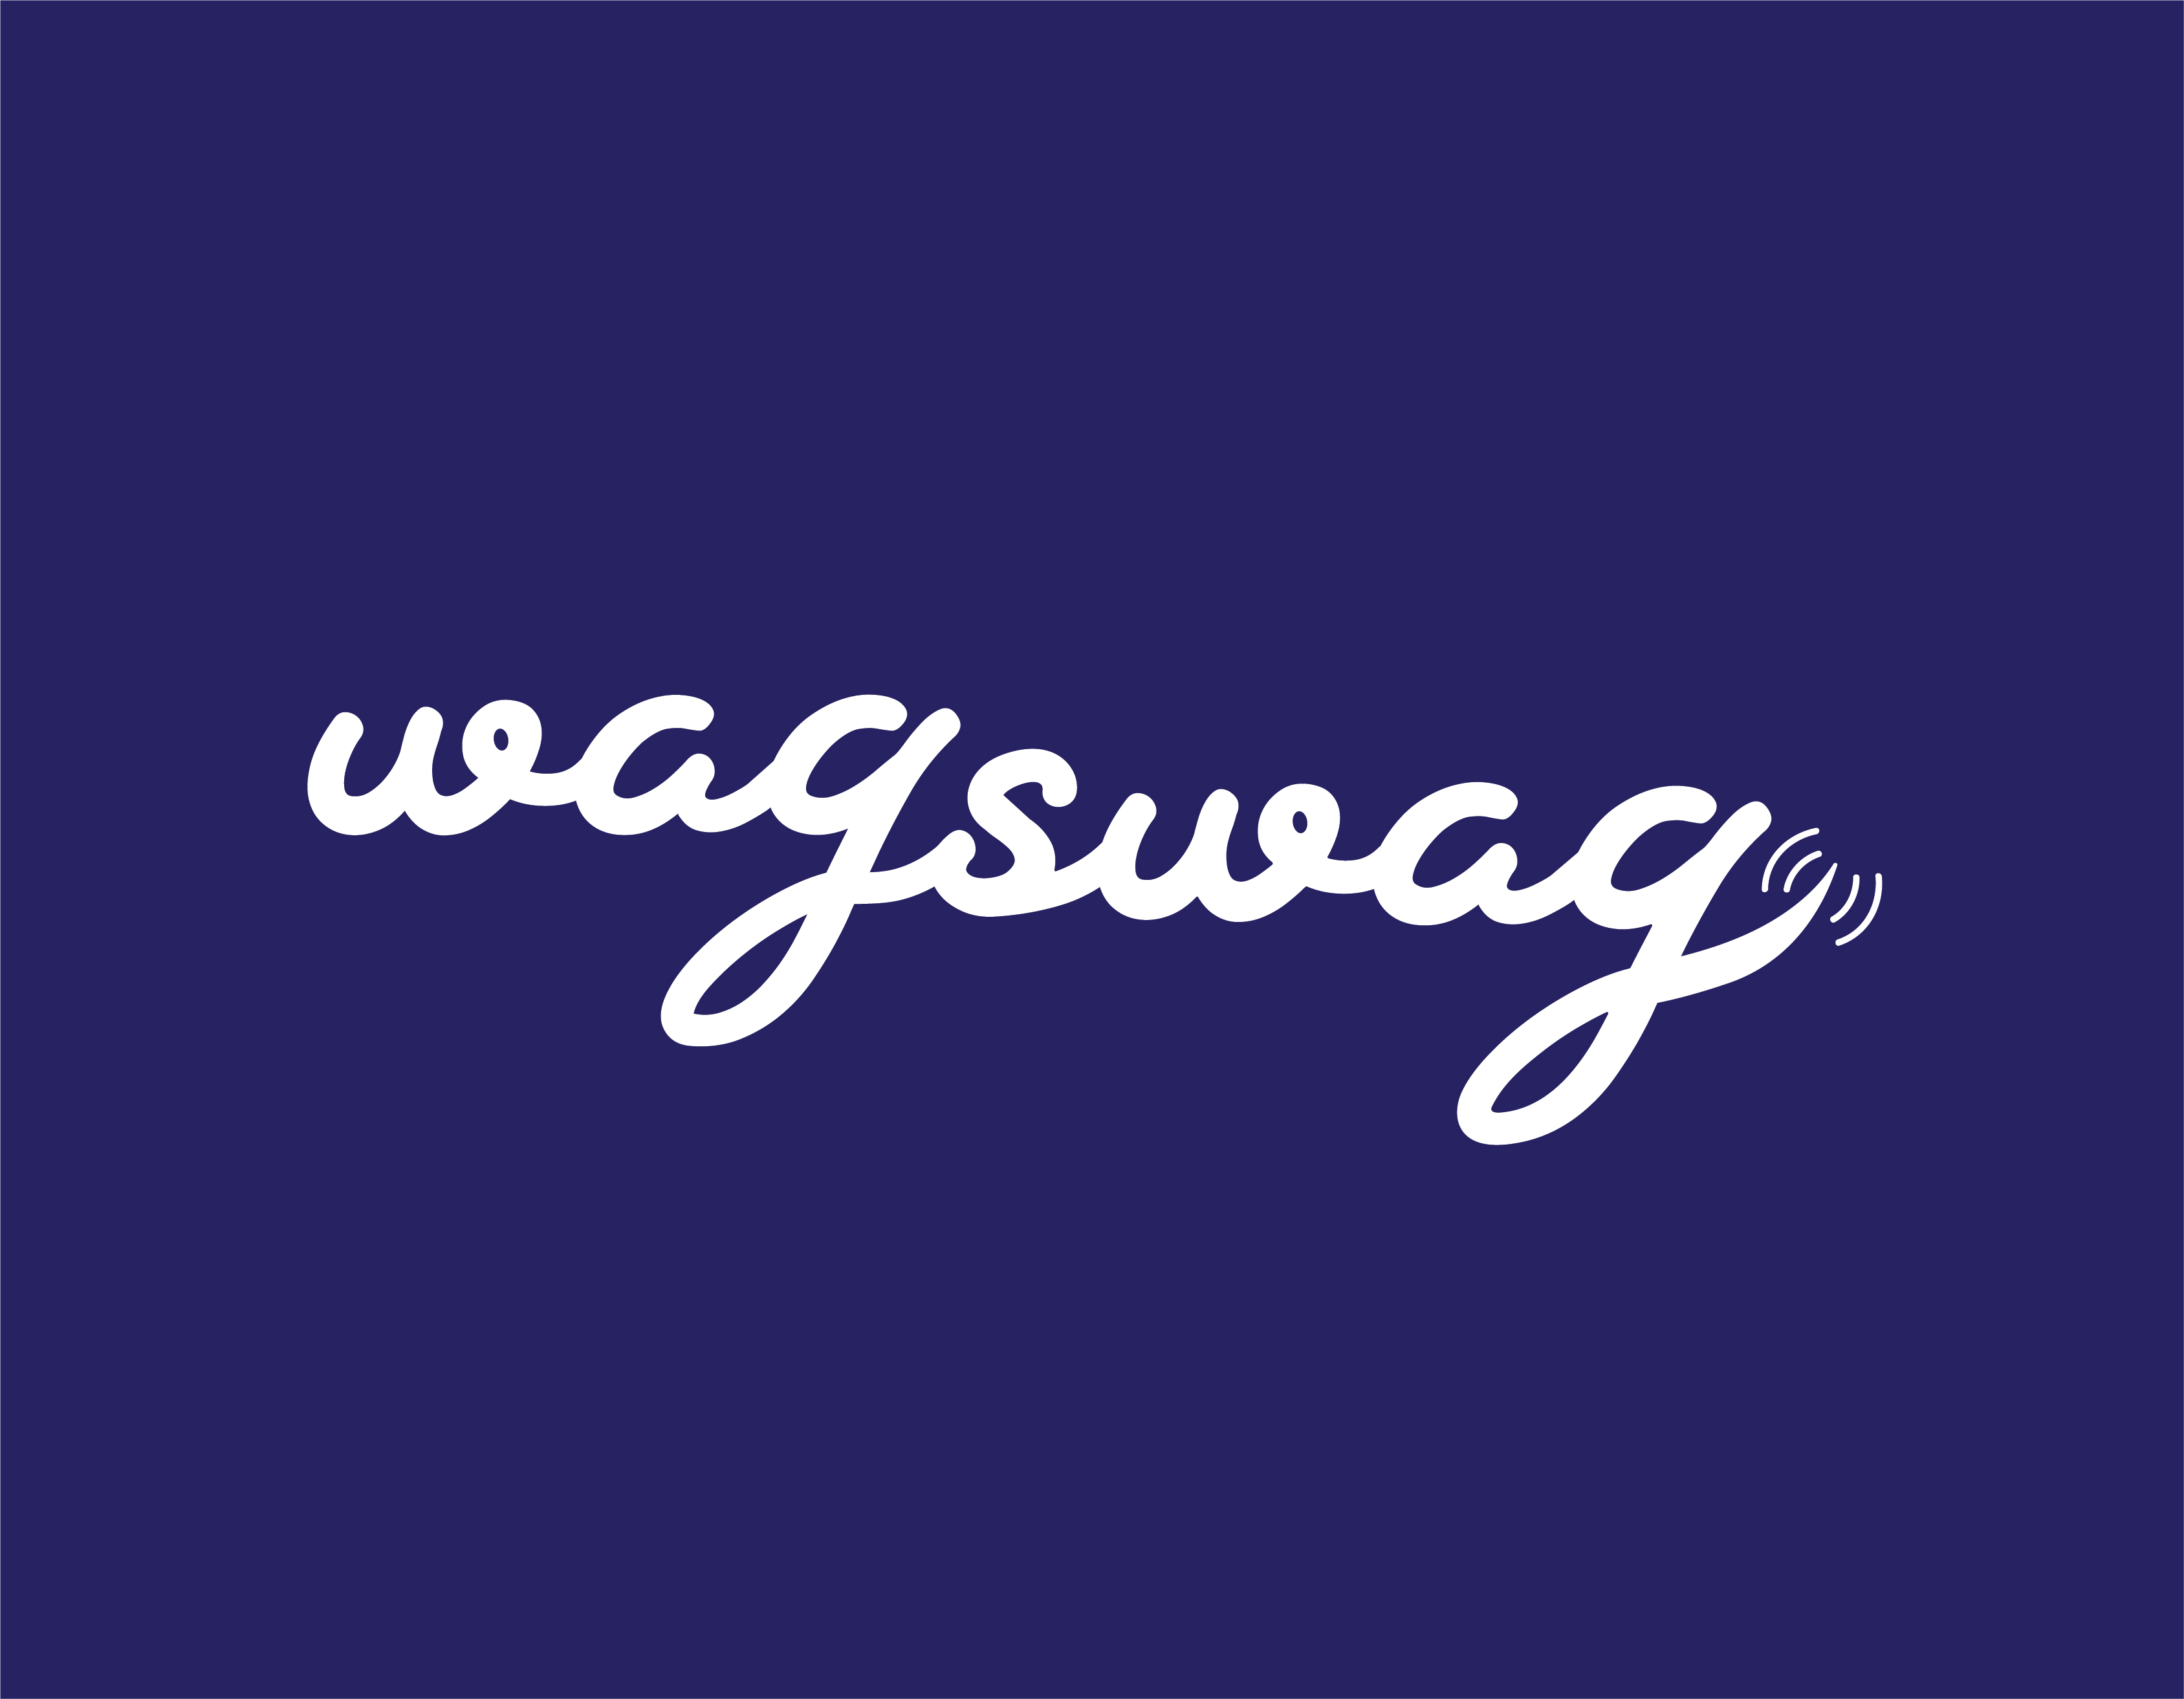 WAGSWAG